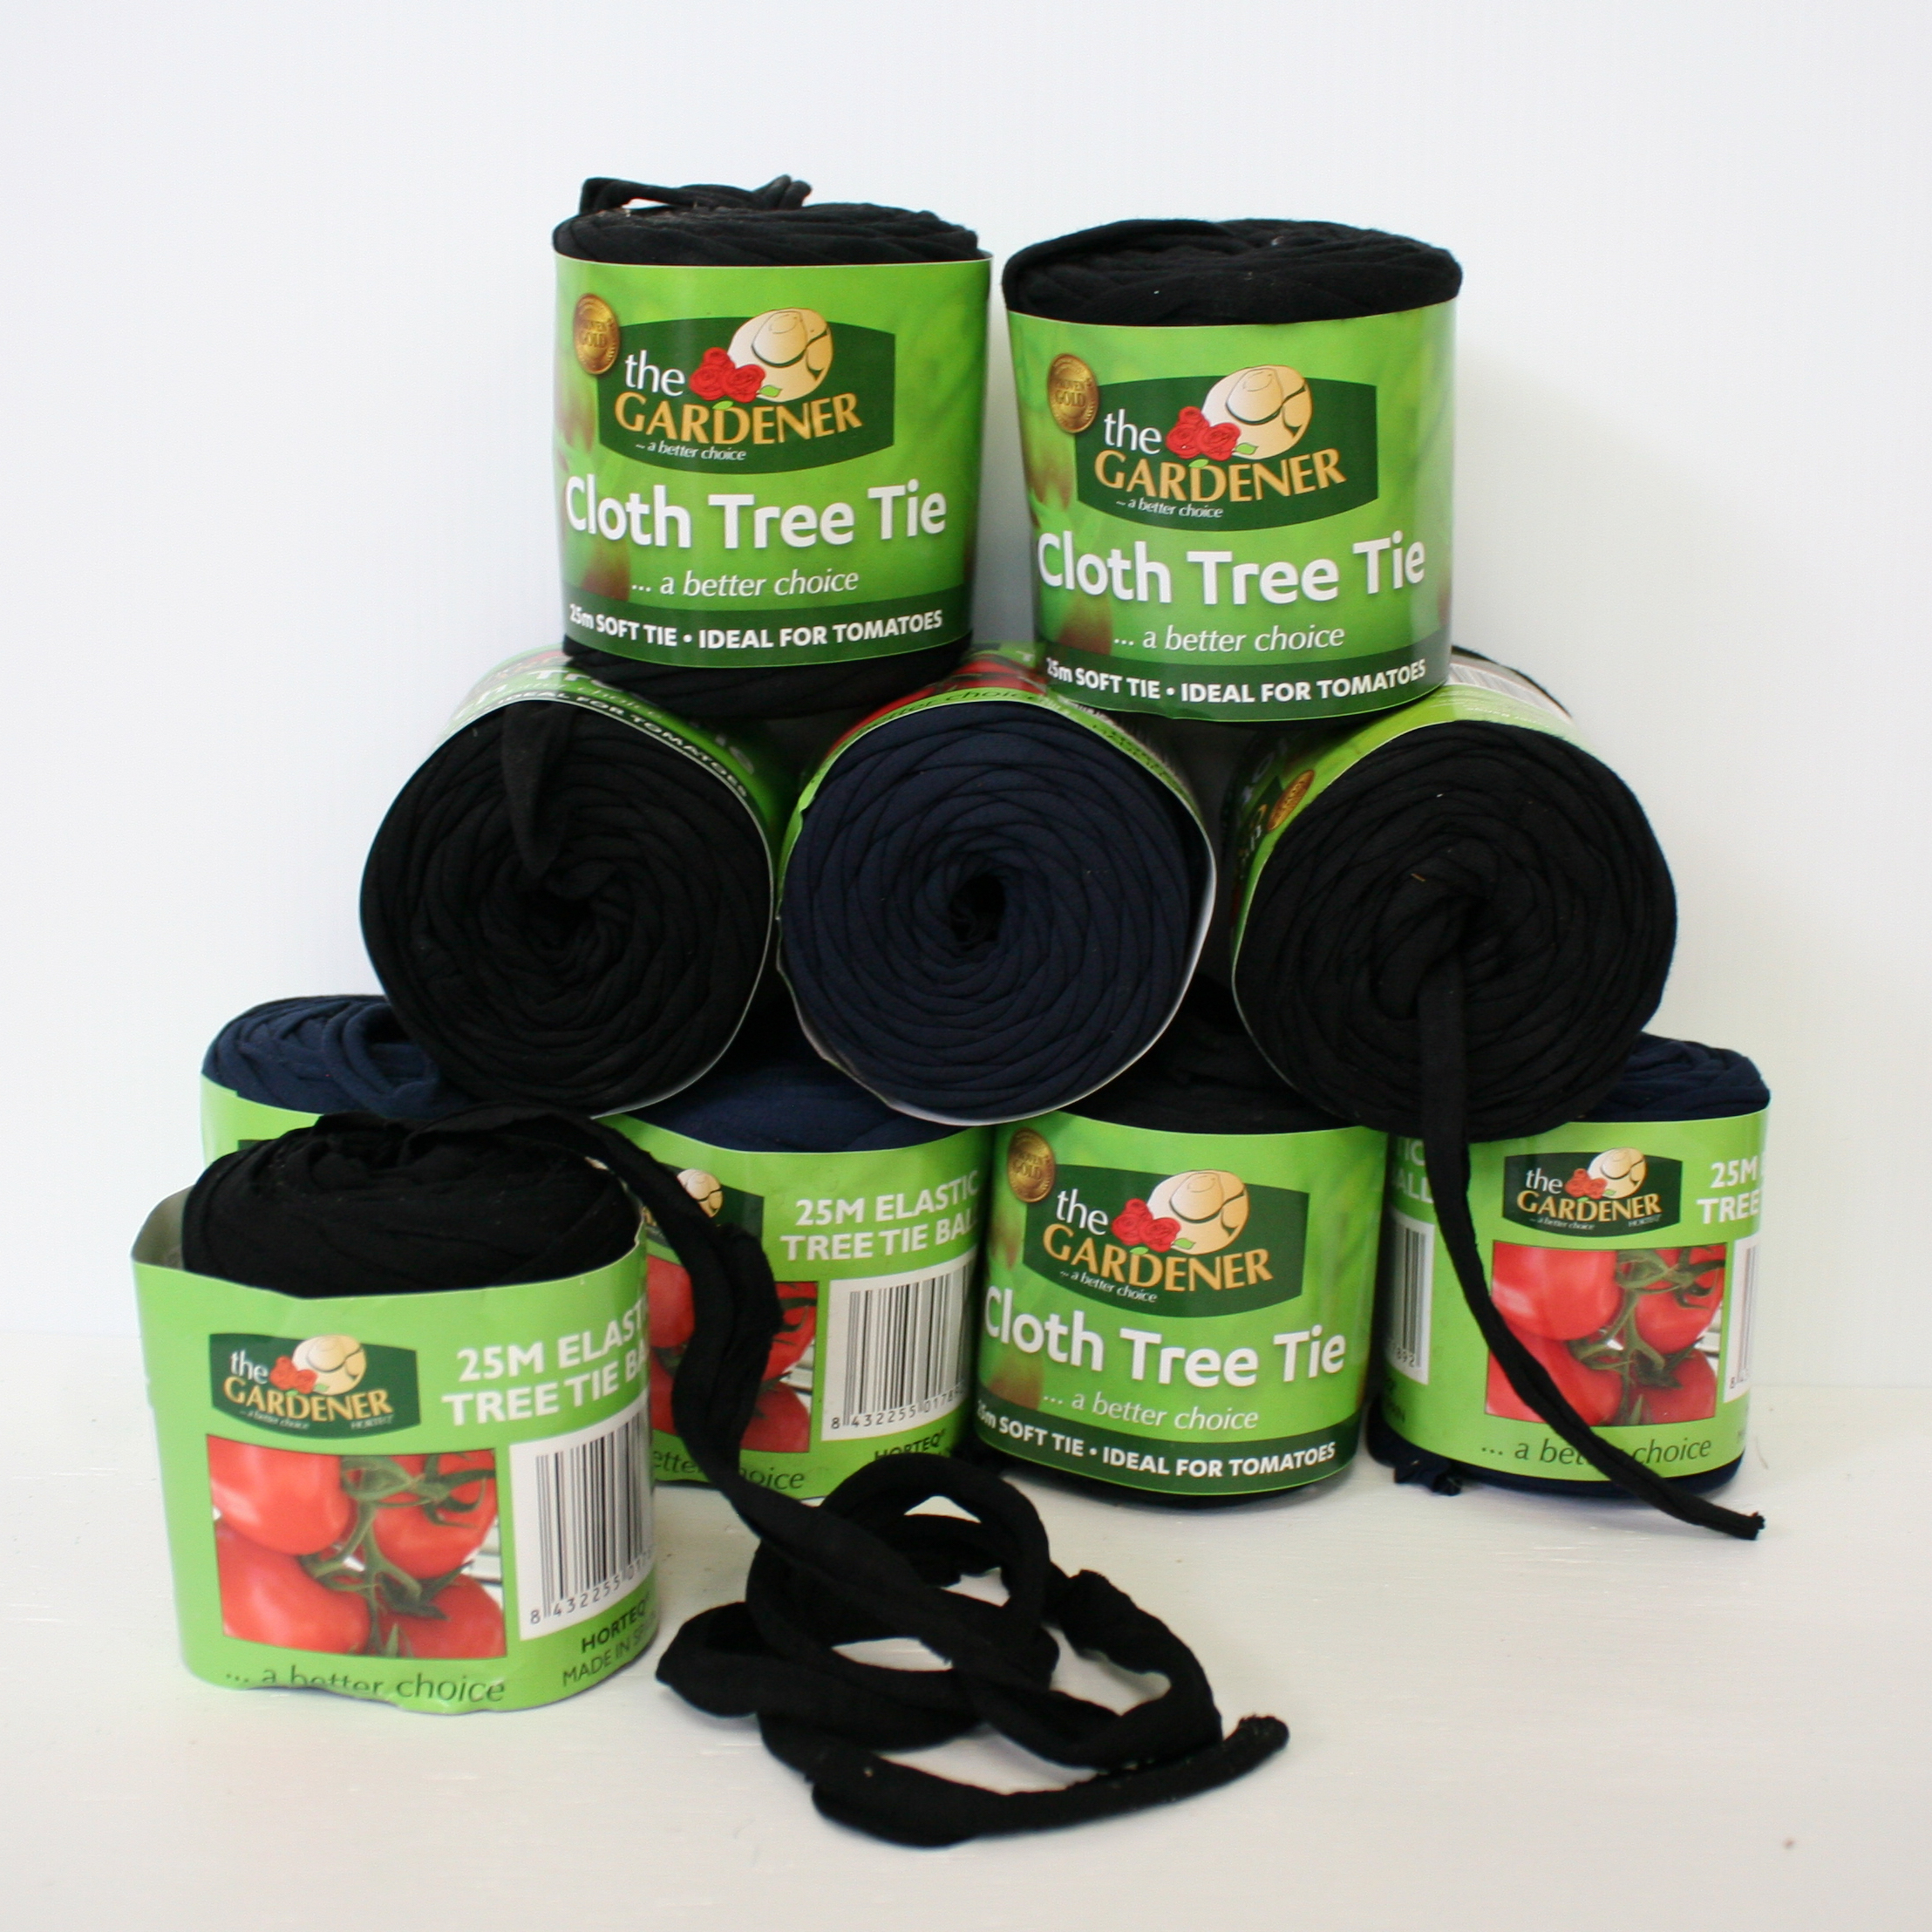 The Gardener Cloth Tree Tie 25m2 for $12 -